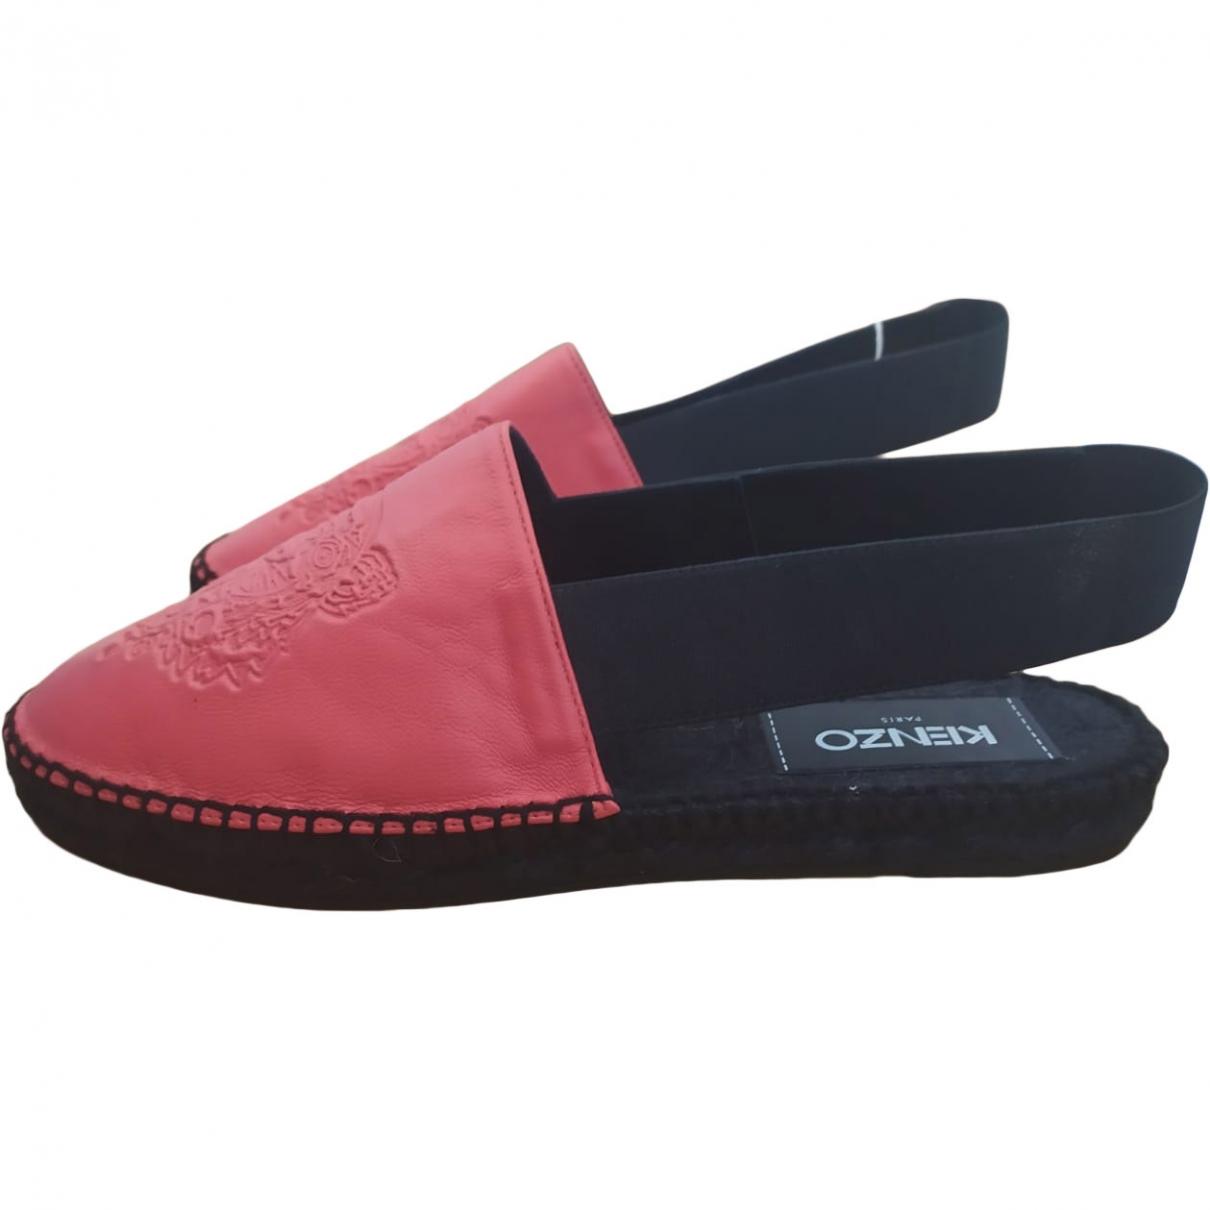 Kenzo \N Orange Leather Espadrilles for Women 37 EU